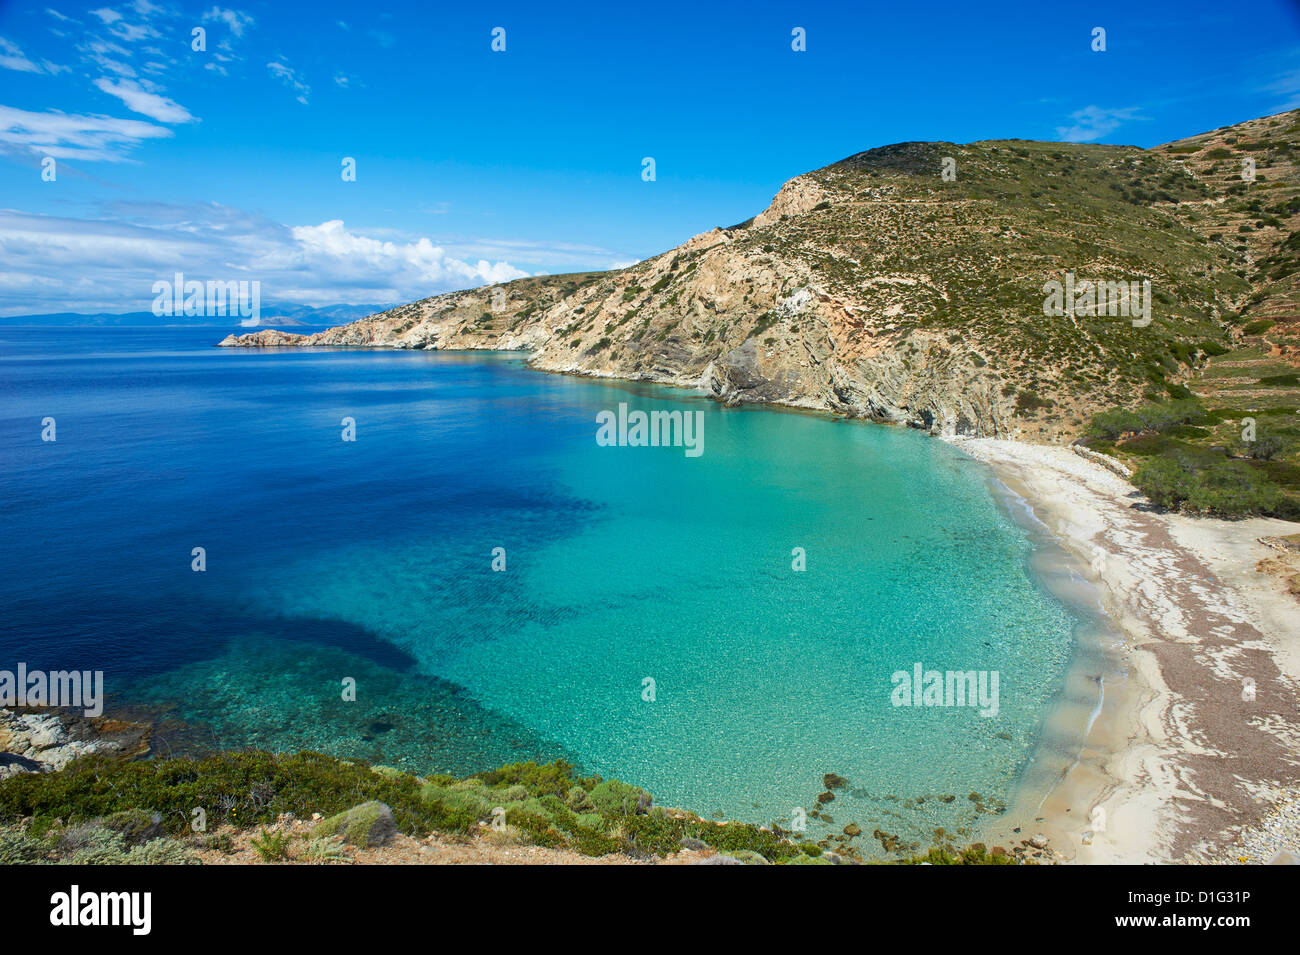 Livadi Beach, Donoussa, Cyclades, Aegean, Greek Islands, Greece, Europe - Stock Image